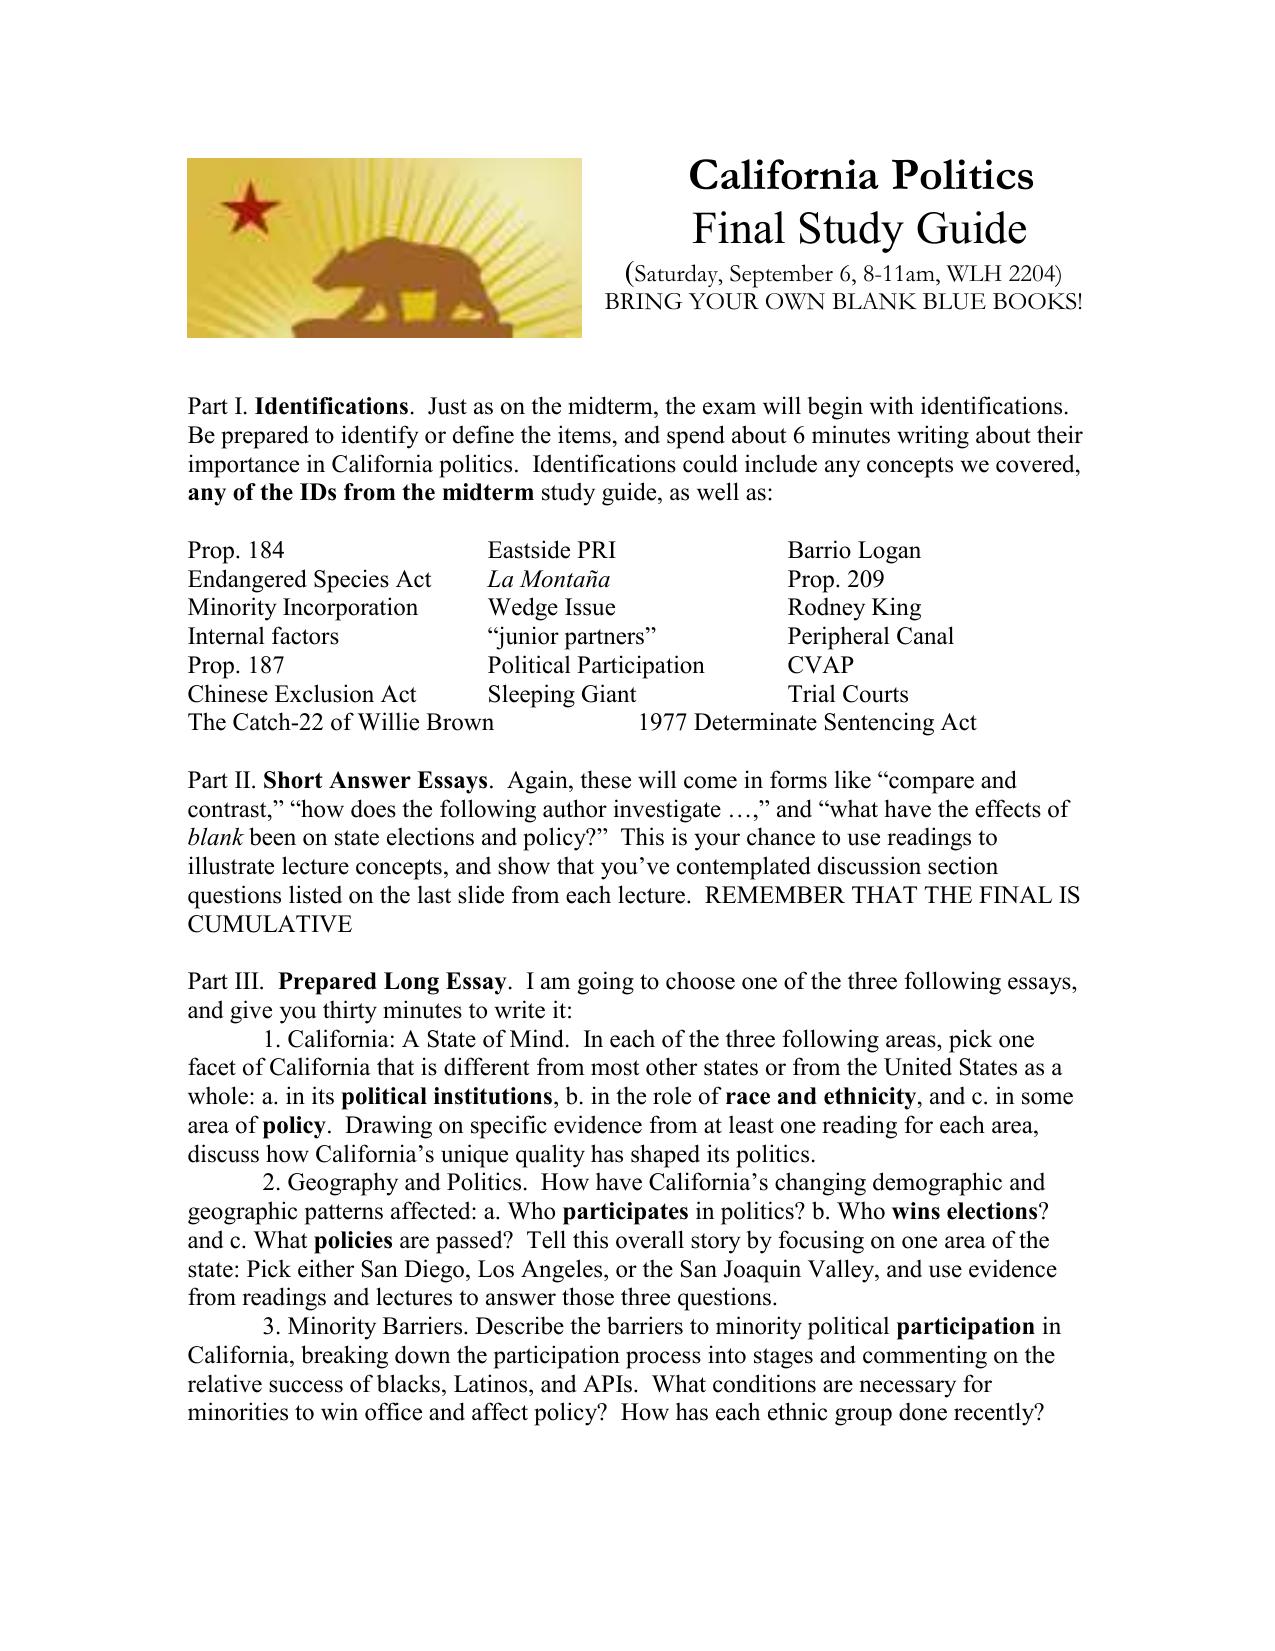 california politics final study guide saturday september 6 8 rh studylib net Army Study Guide Questions Study Guide Format